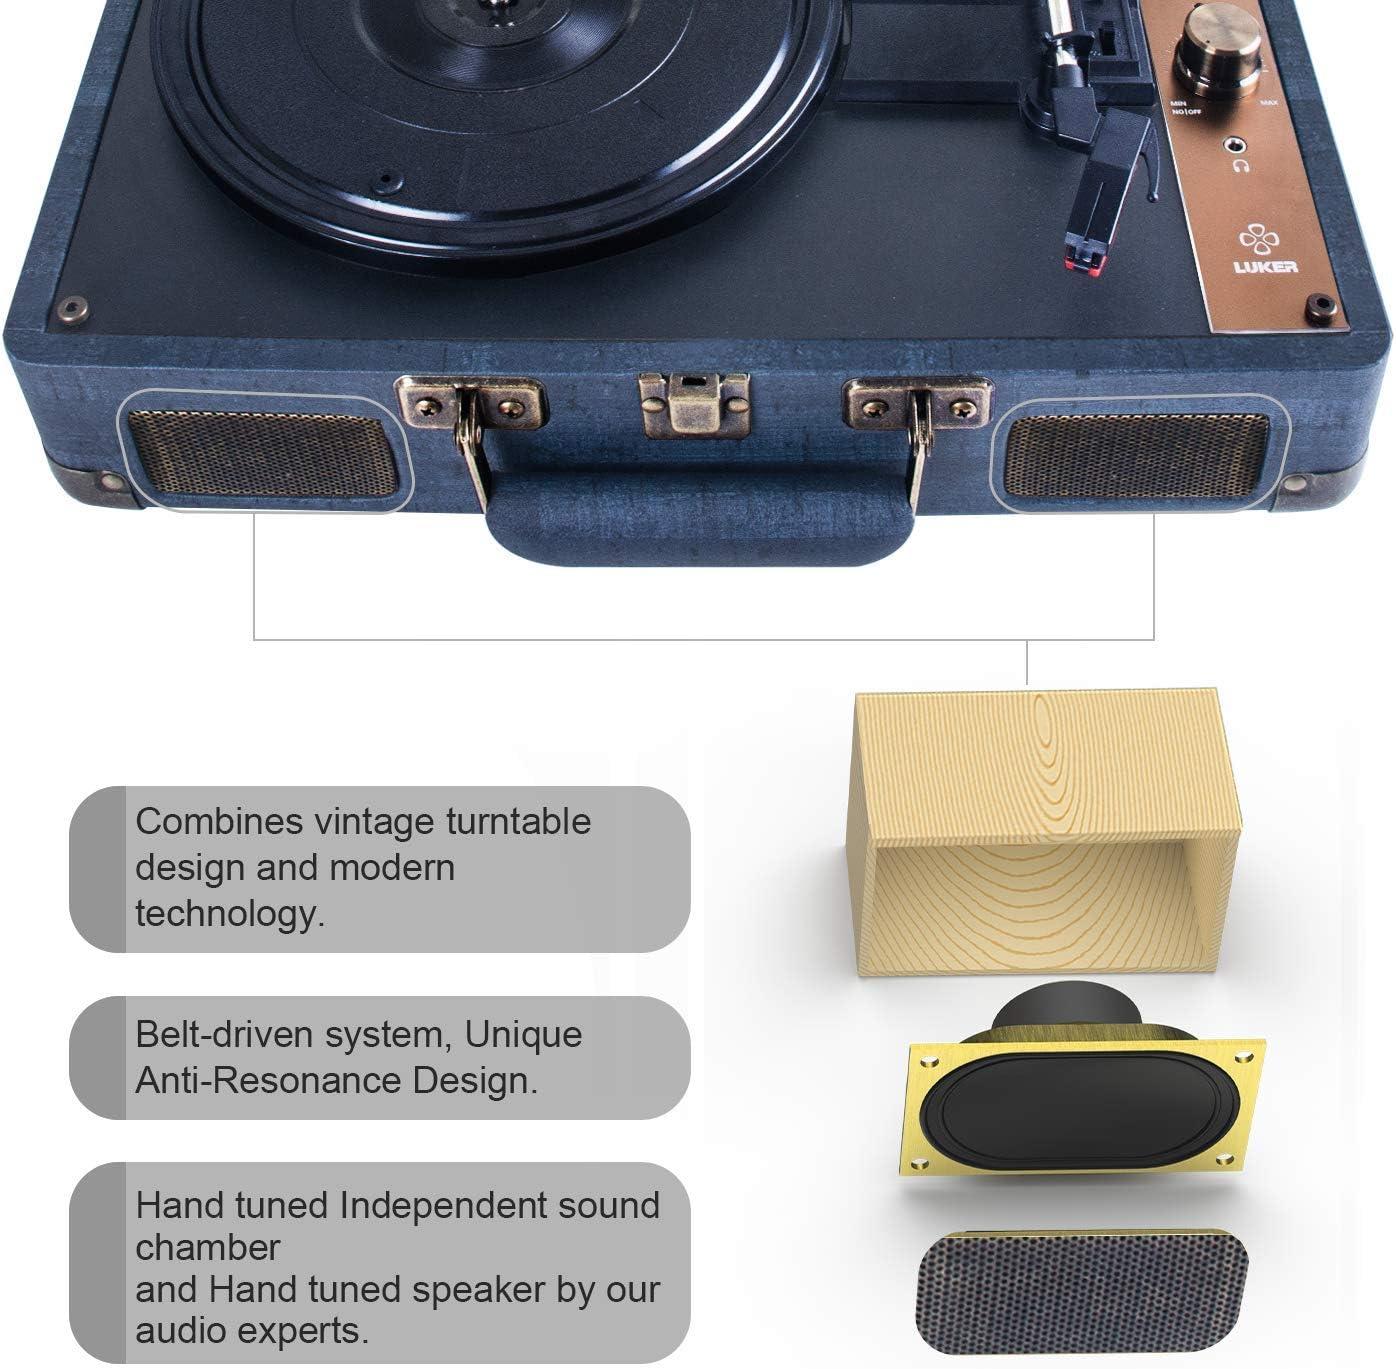 Amazon.com: LUKER - Reproductor de grabación, portátil con ...